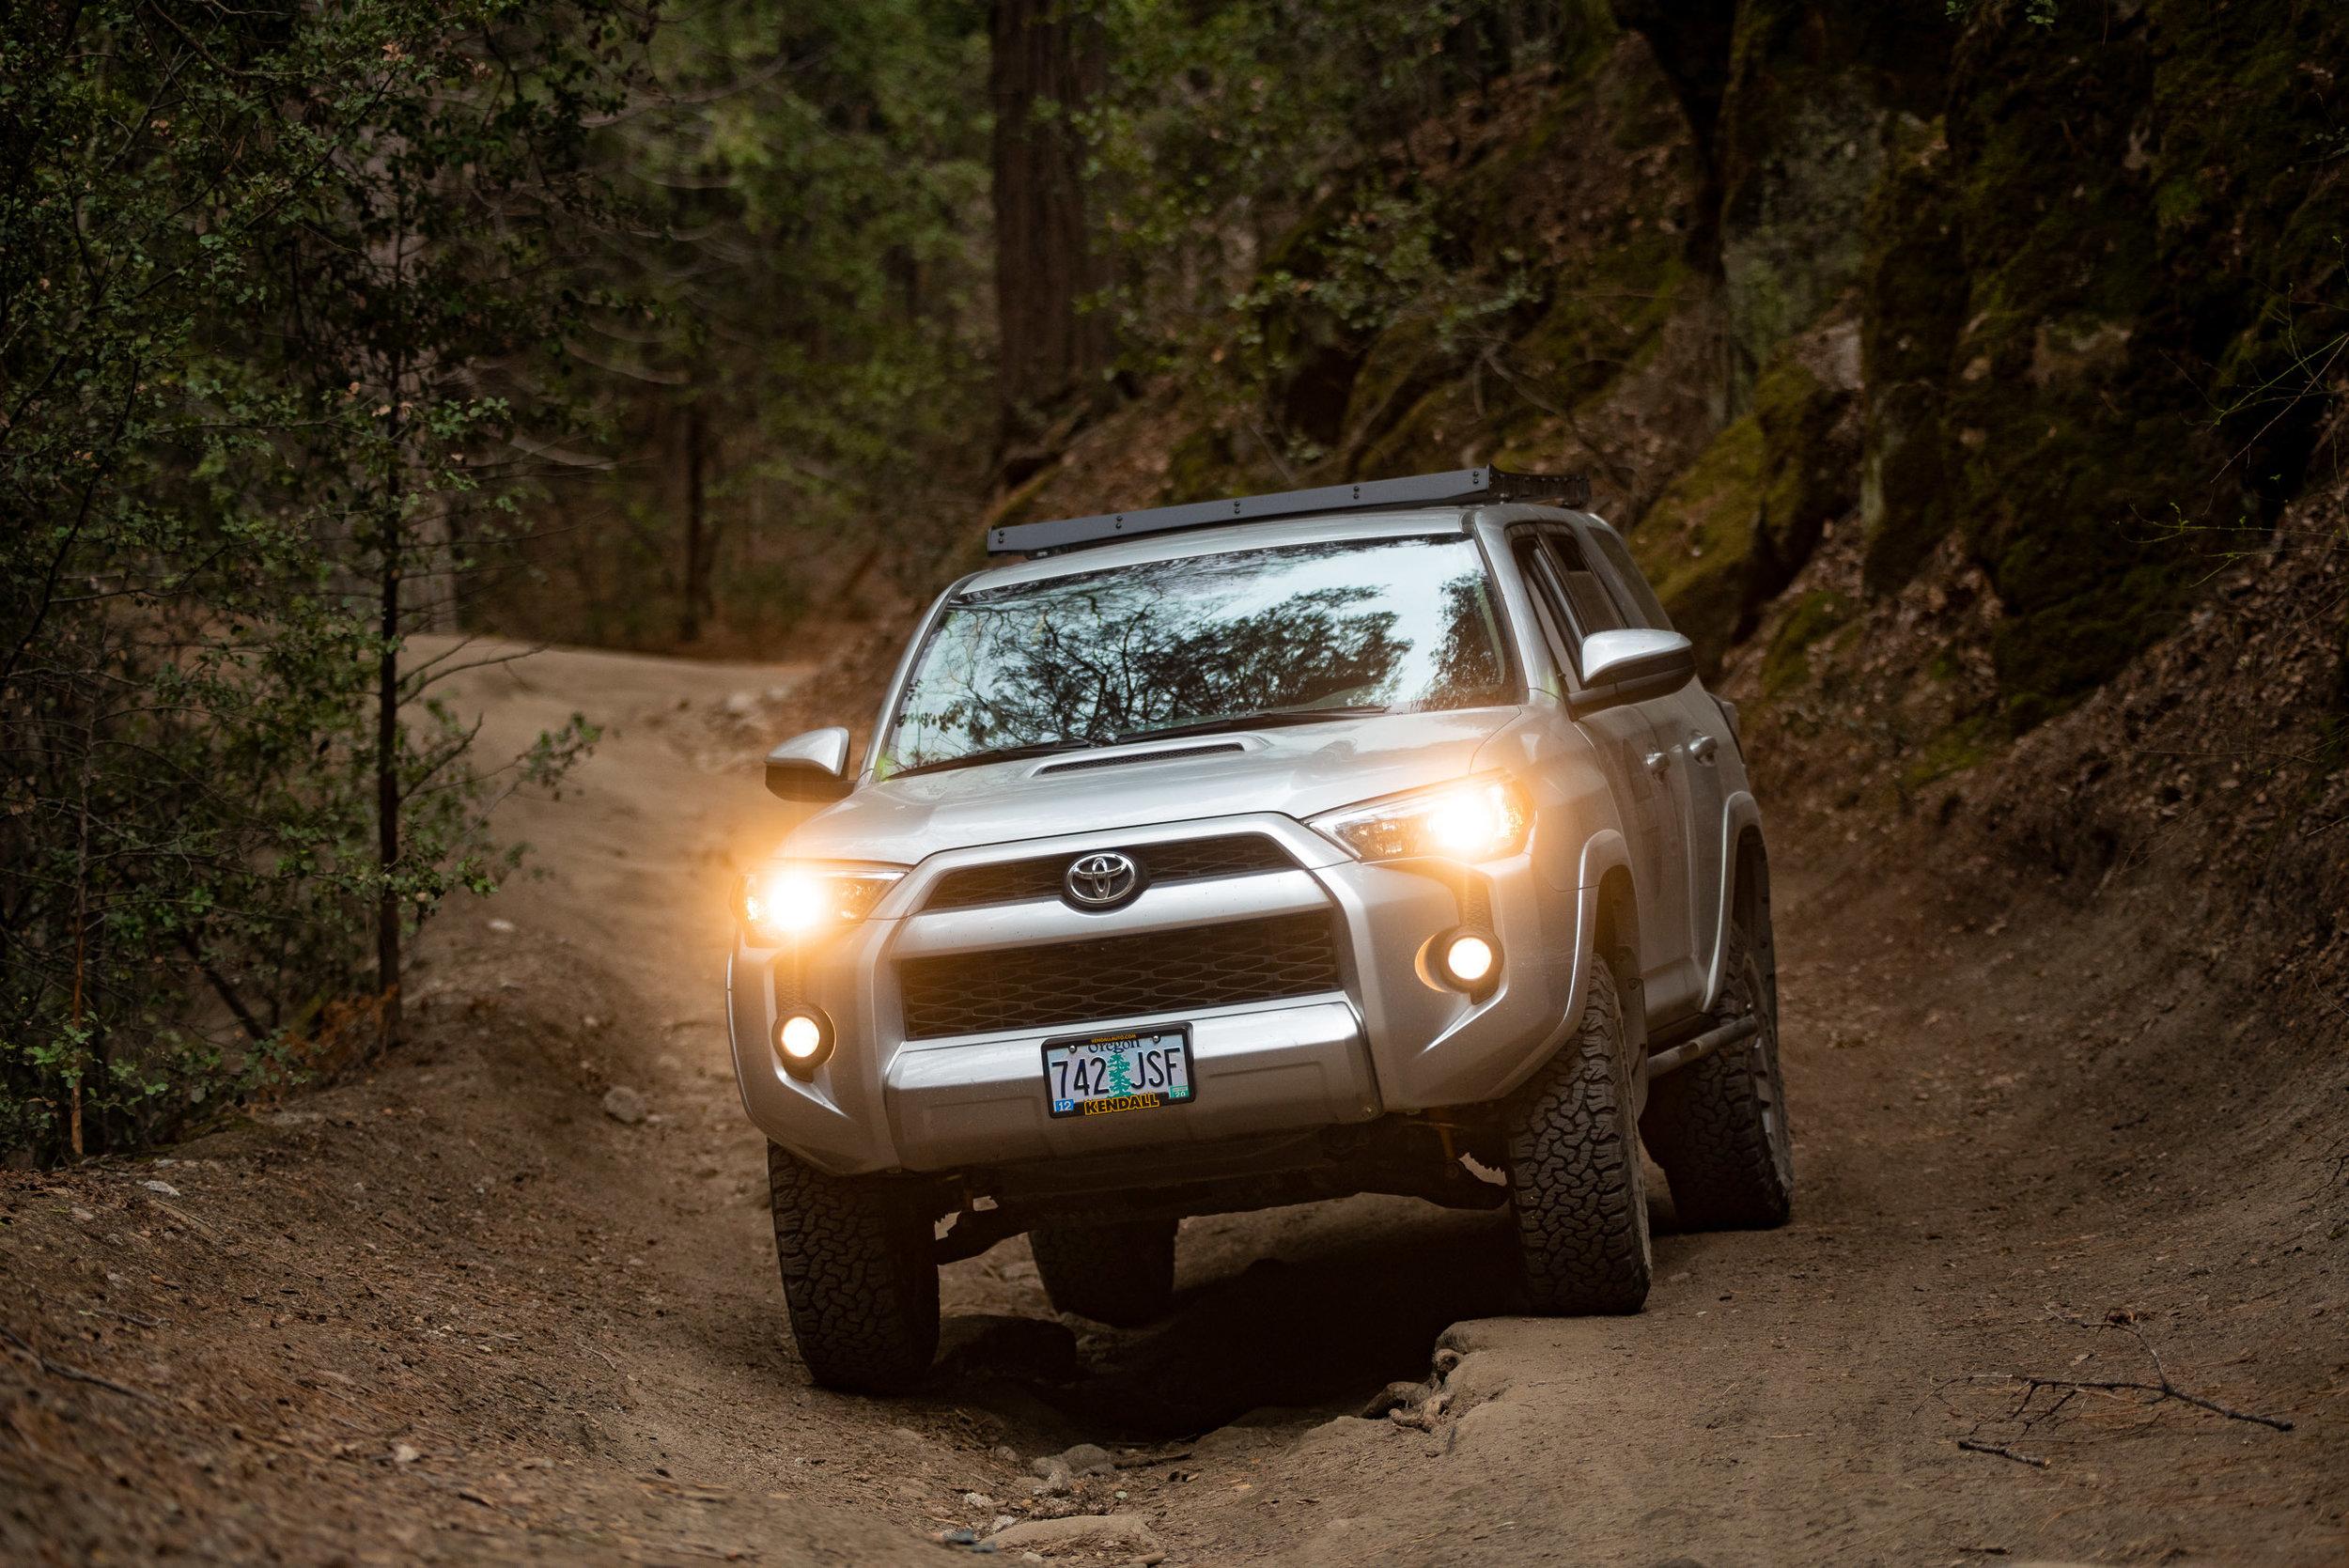 toyota-4runner-4x4-dirt-road-san-jacinto-truck-trail.jpg